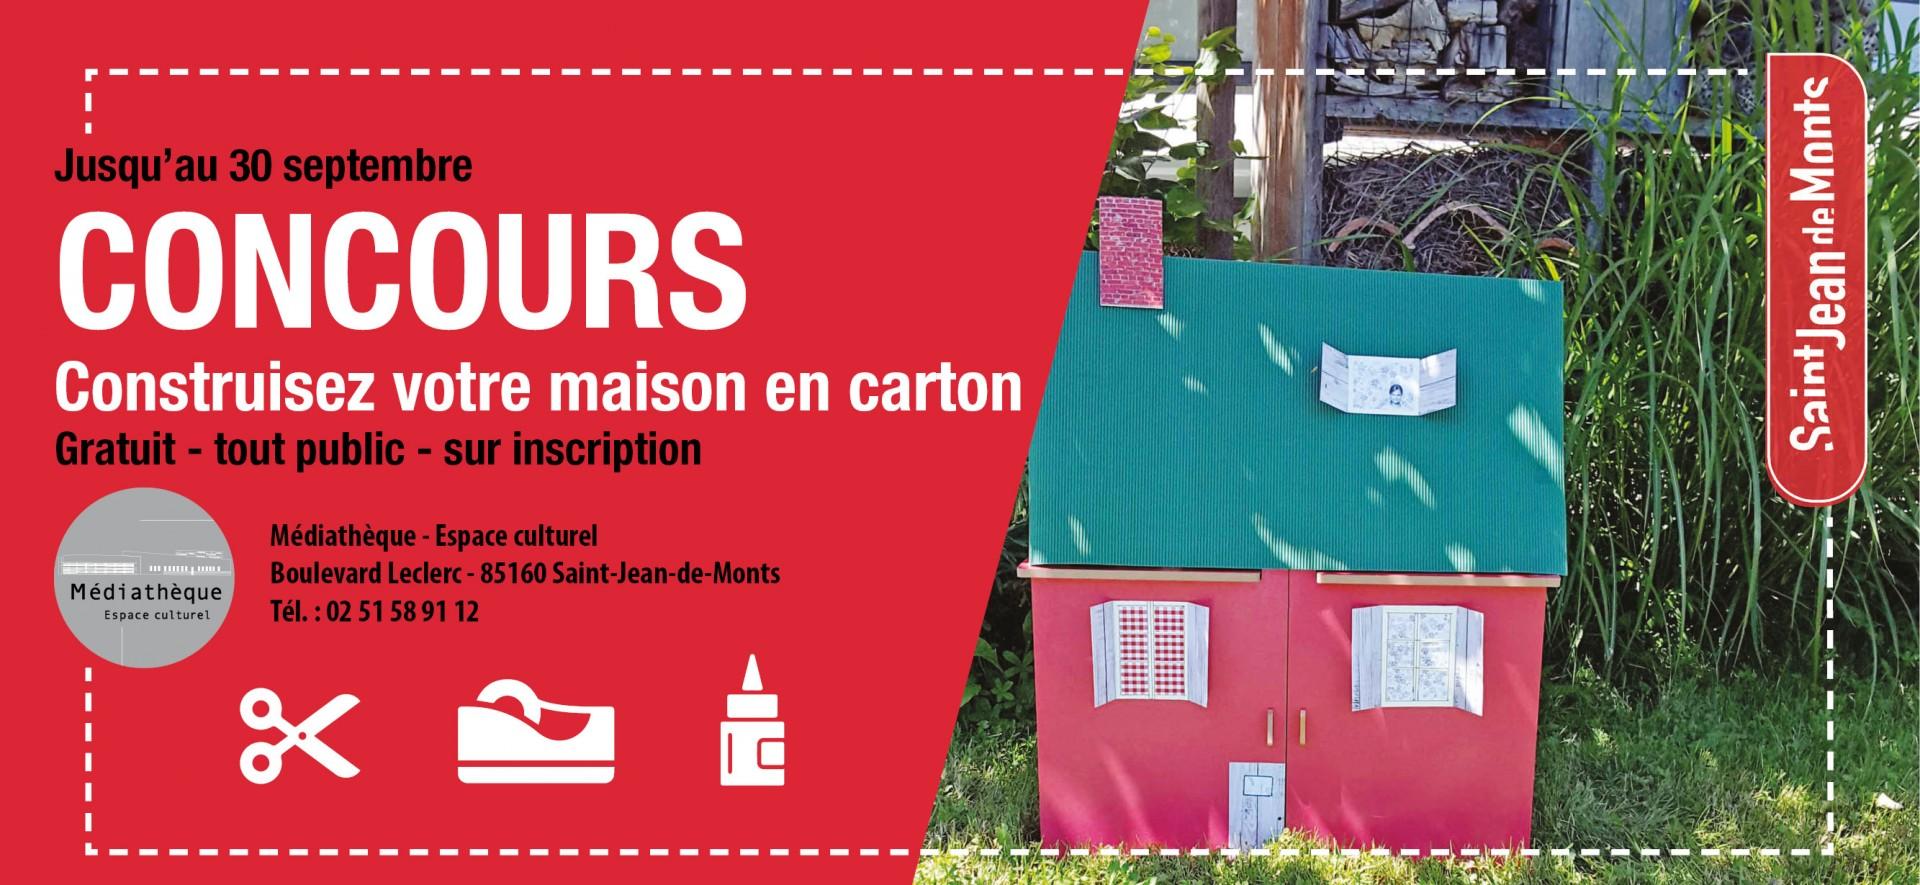 concourours-maison-carton-caroussel-6858